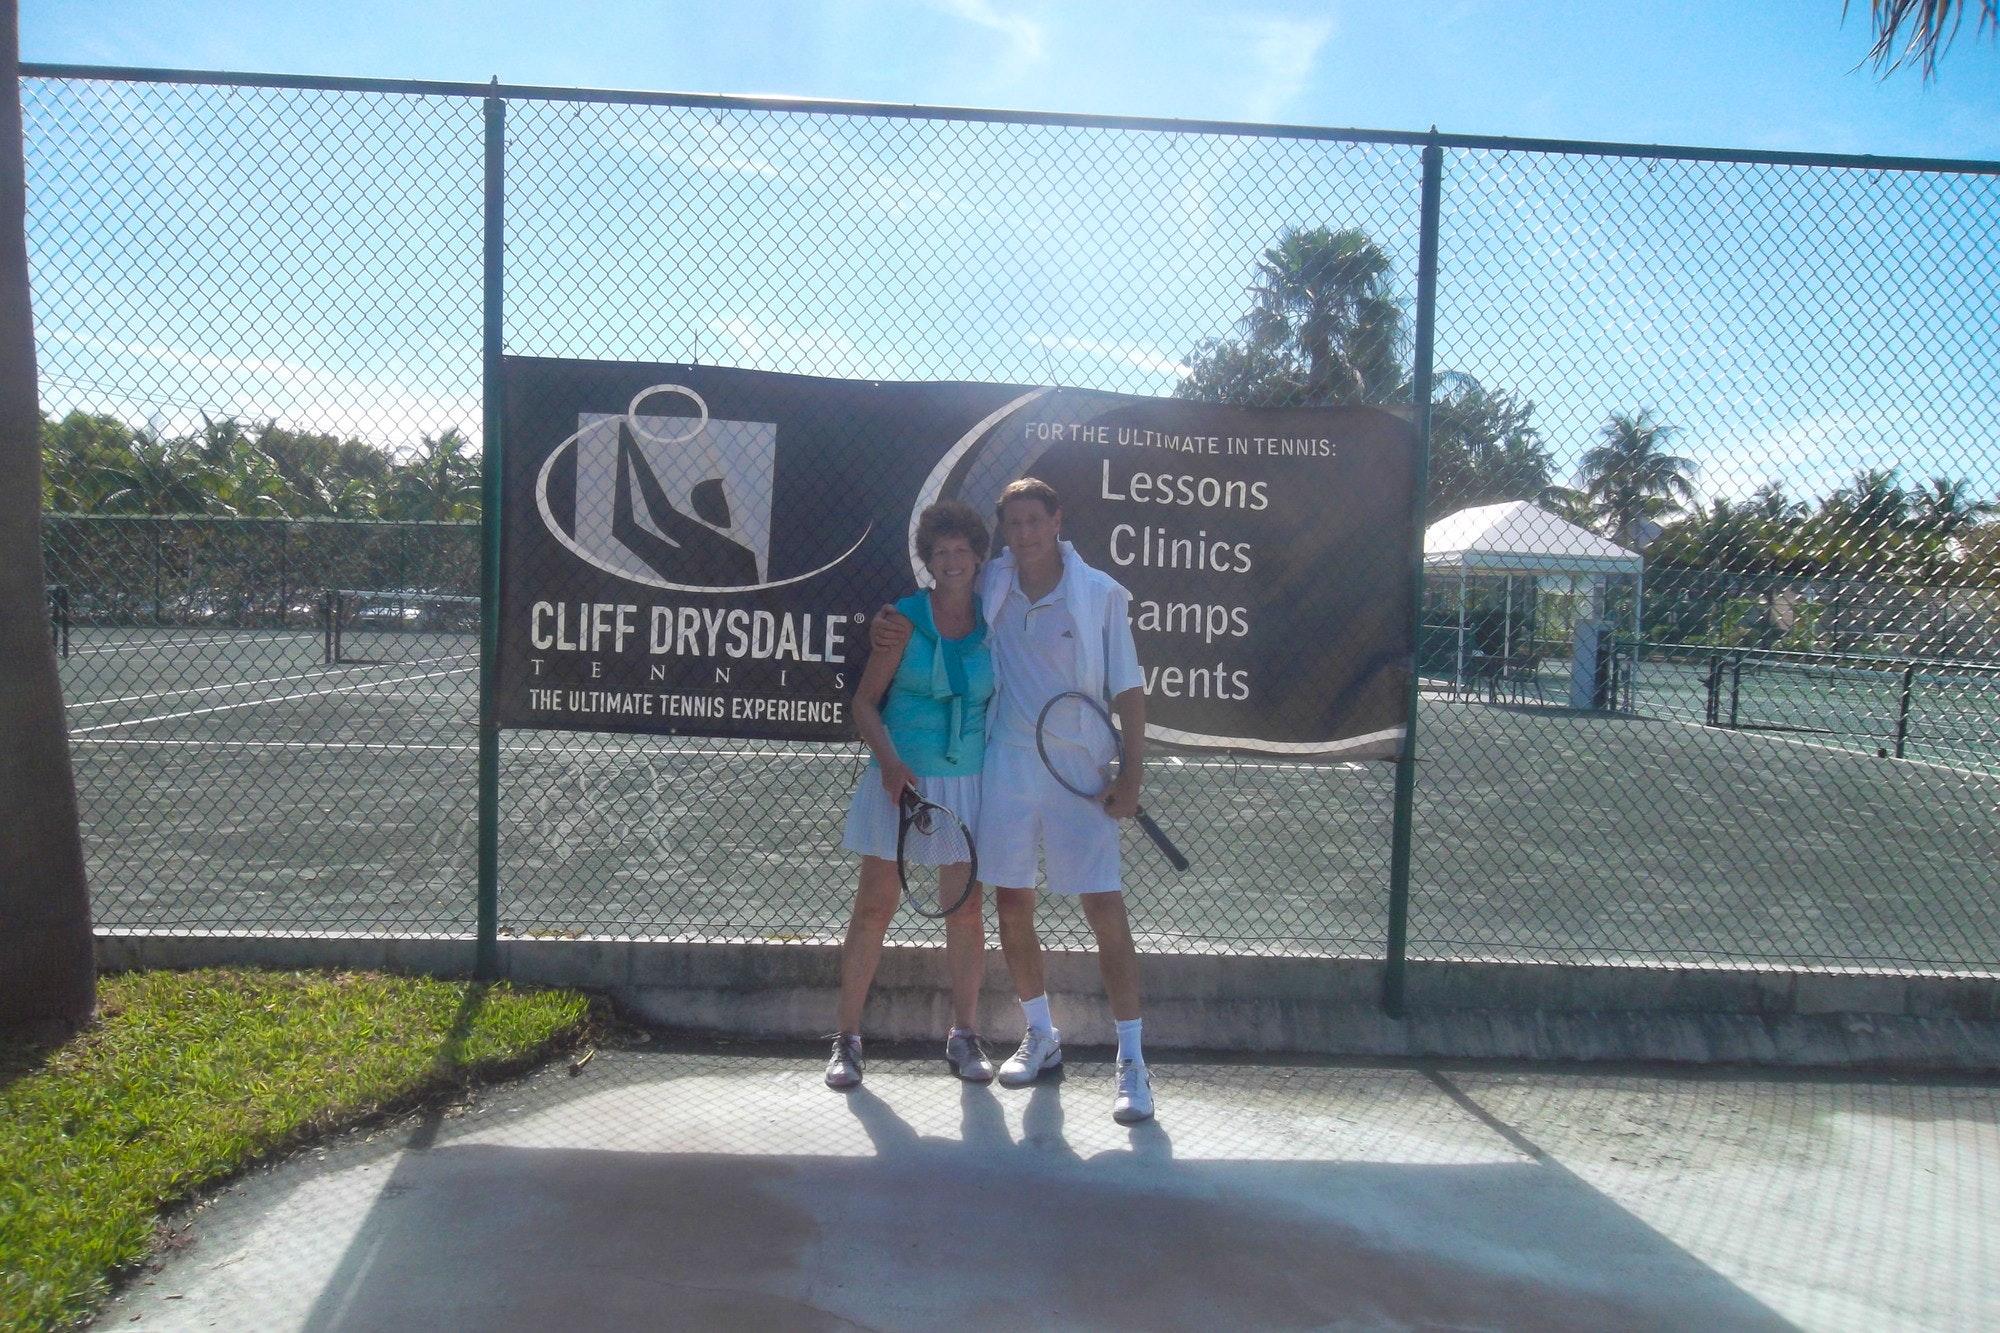 Douglas teaches tennis lessons in Towson, MD